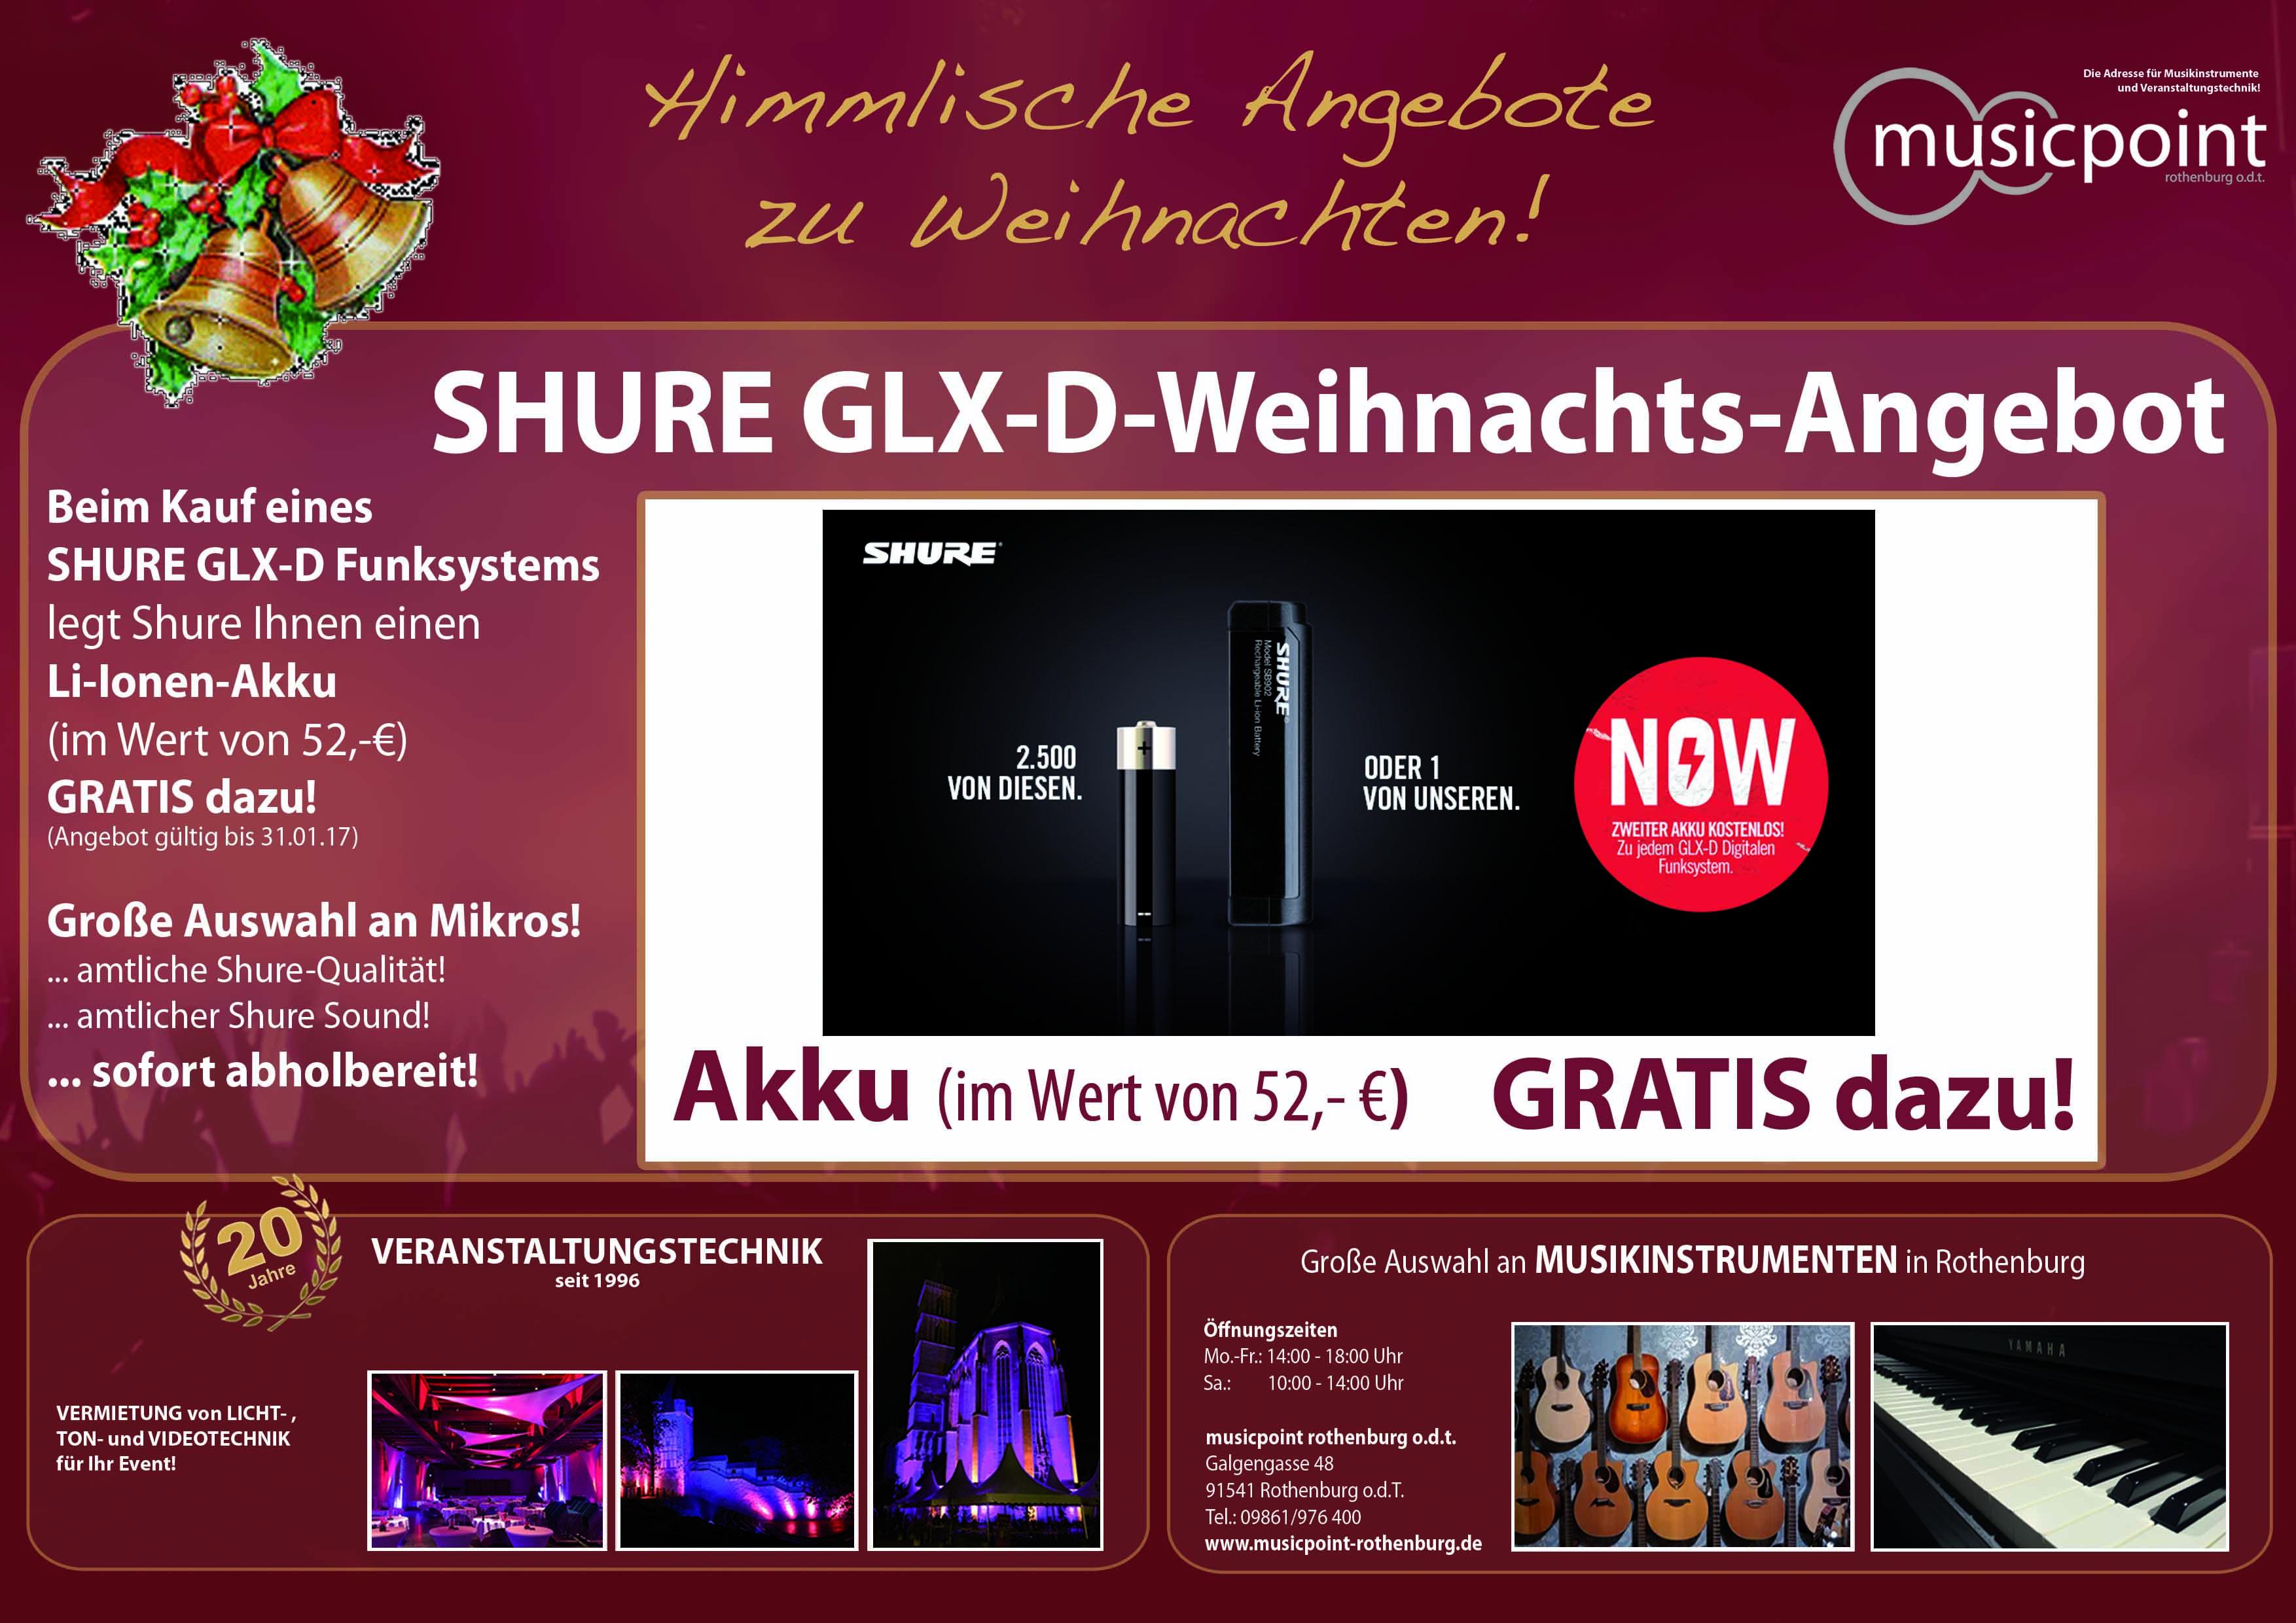 musicpoint_werbung_a4_quer_weihnacht_shure_glx